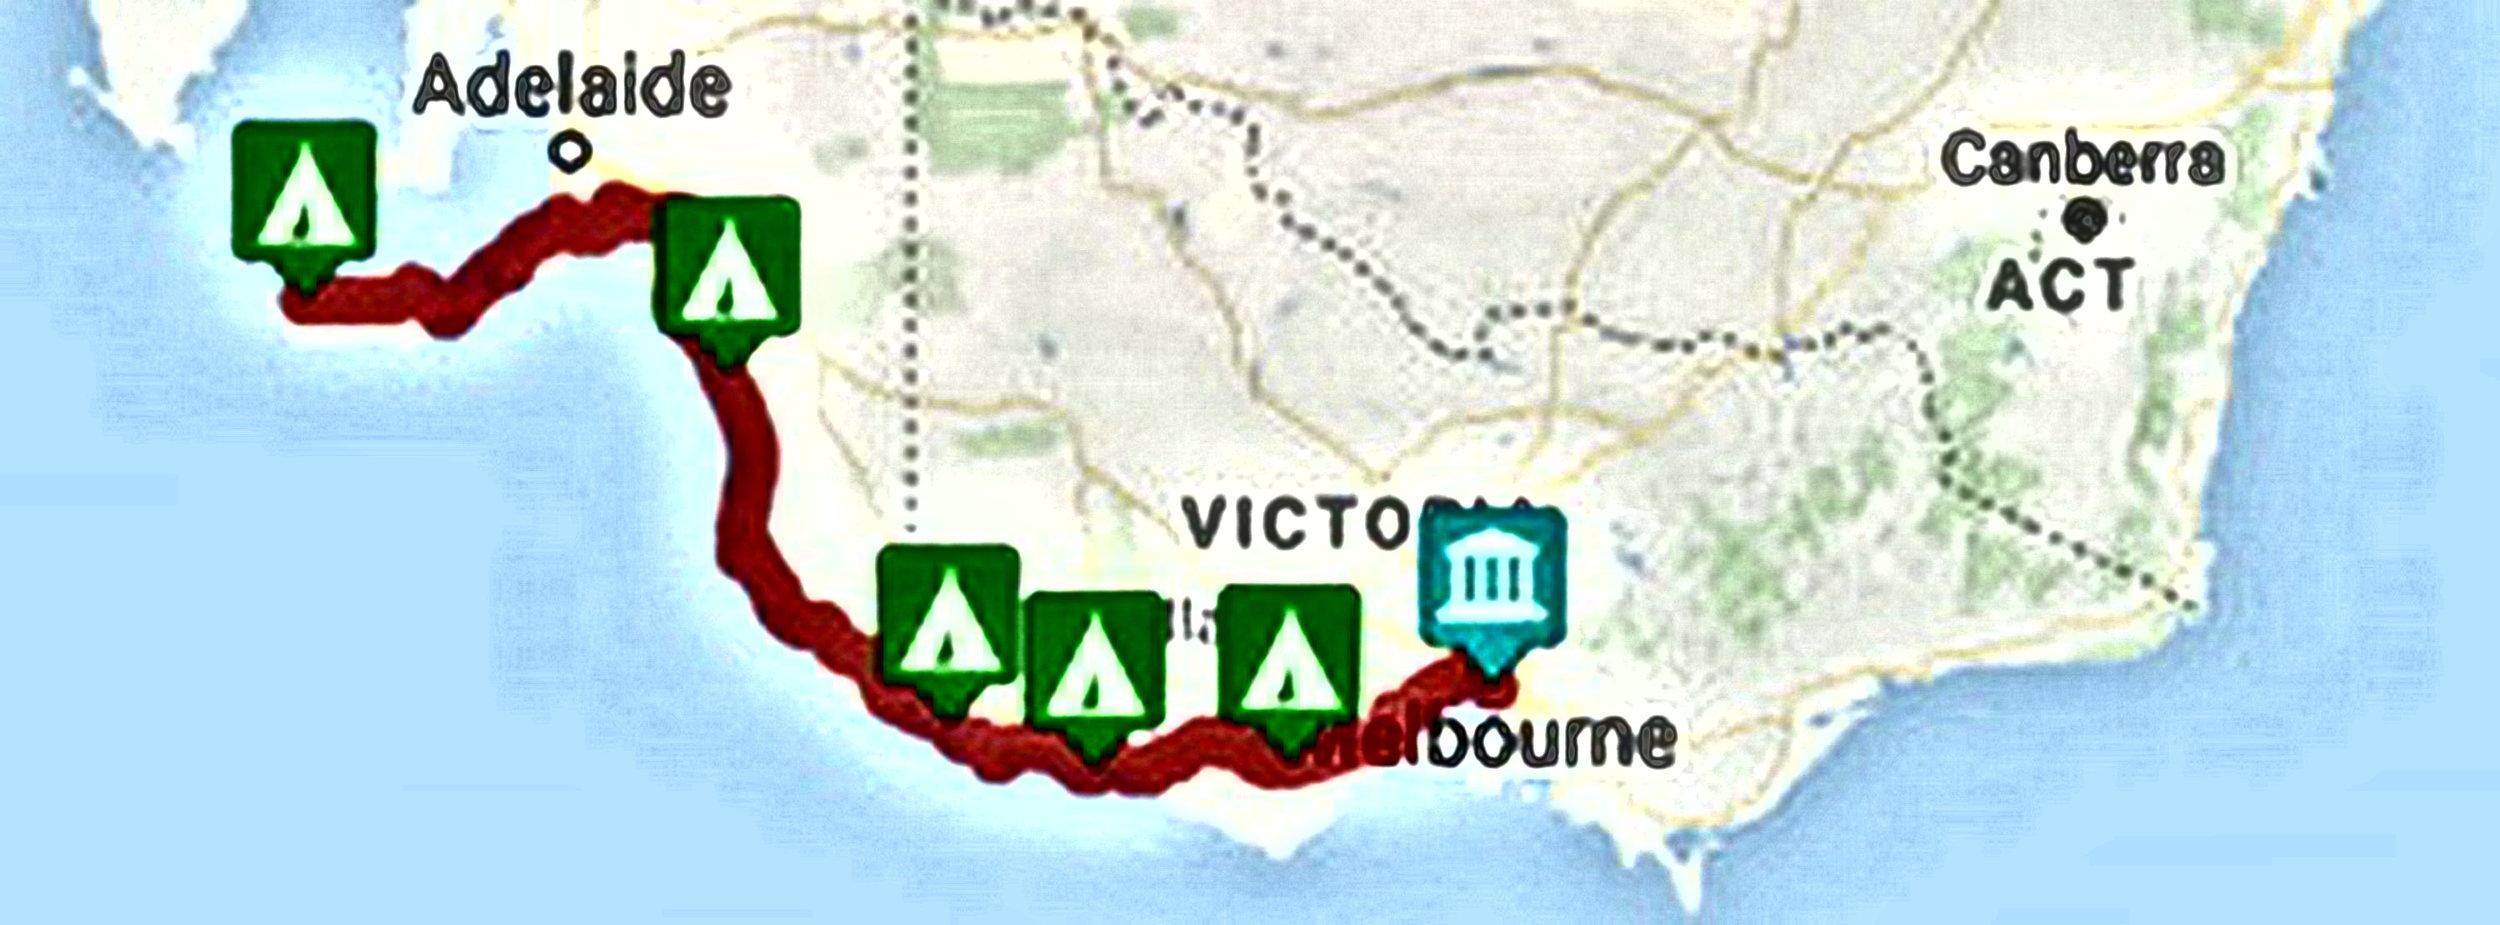 01_Melbourne to Kangaroo Island_March2017_dramatic.jpg